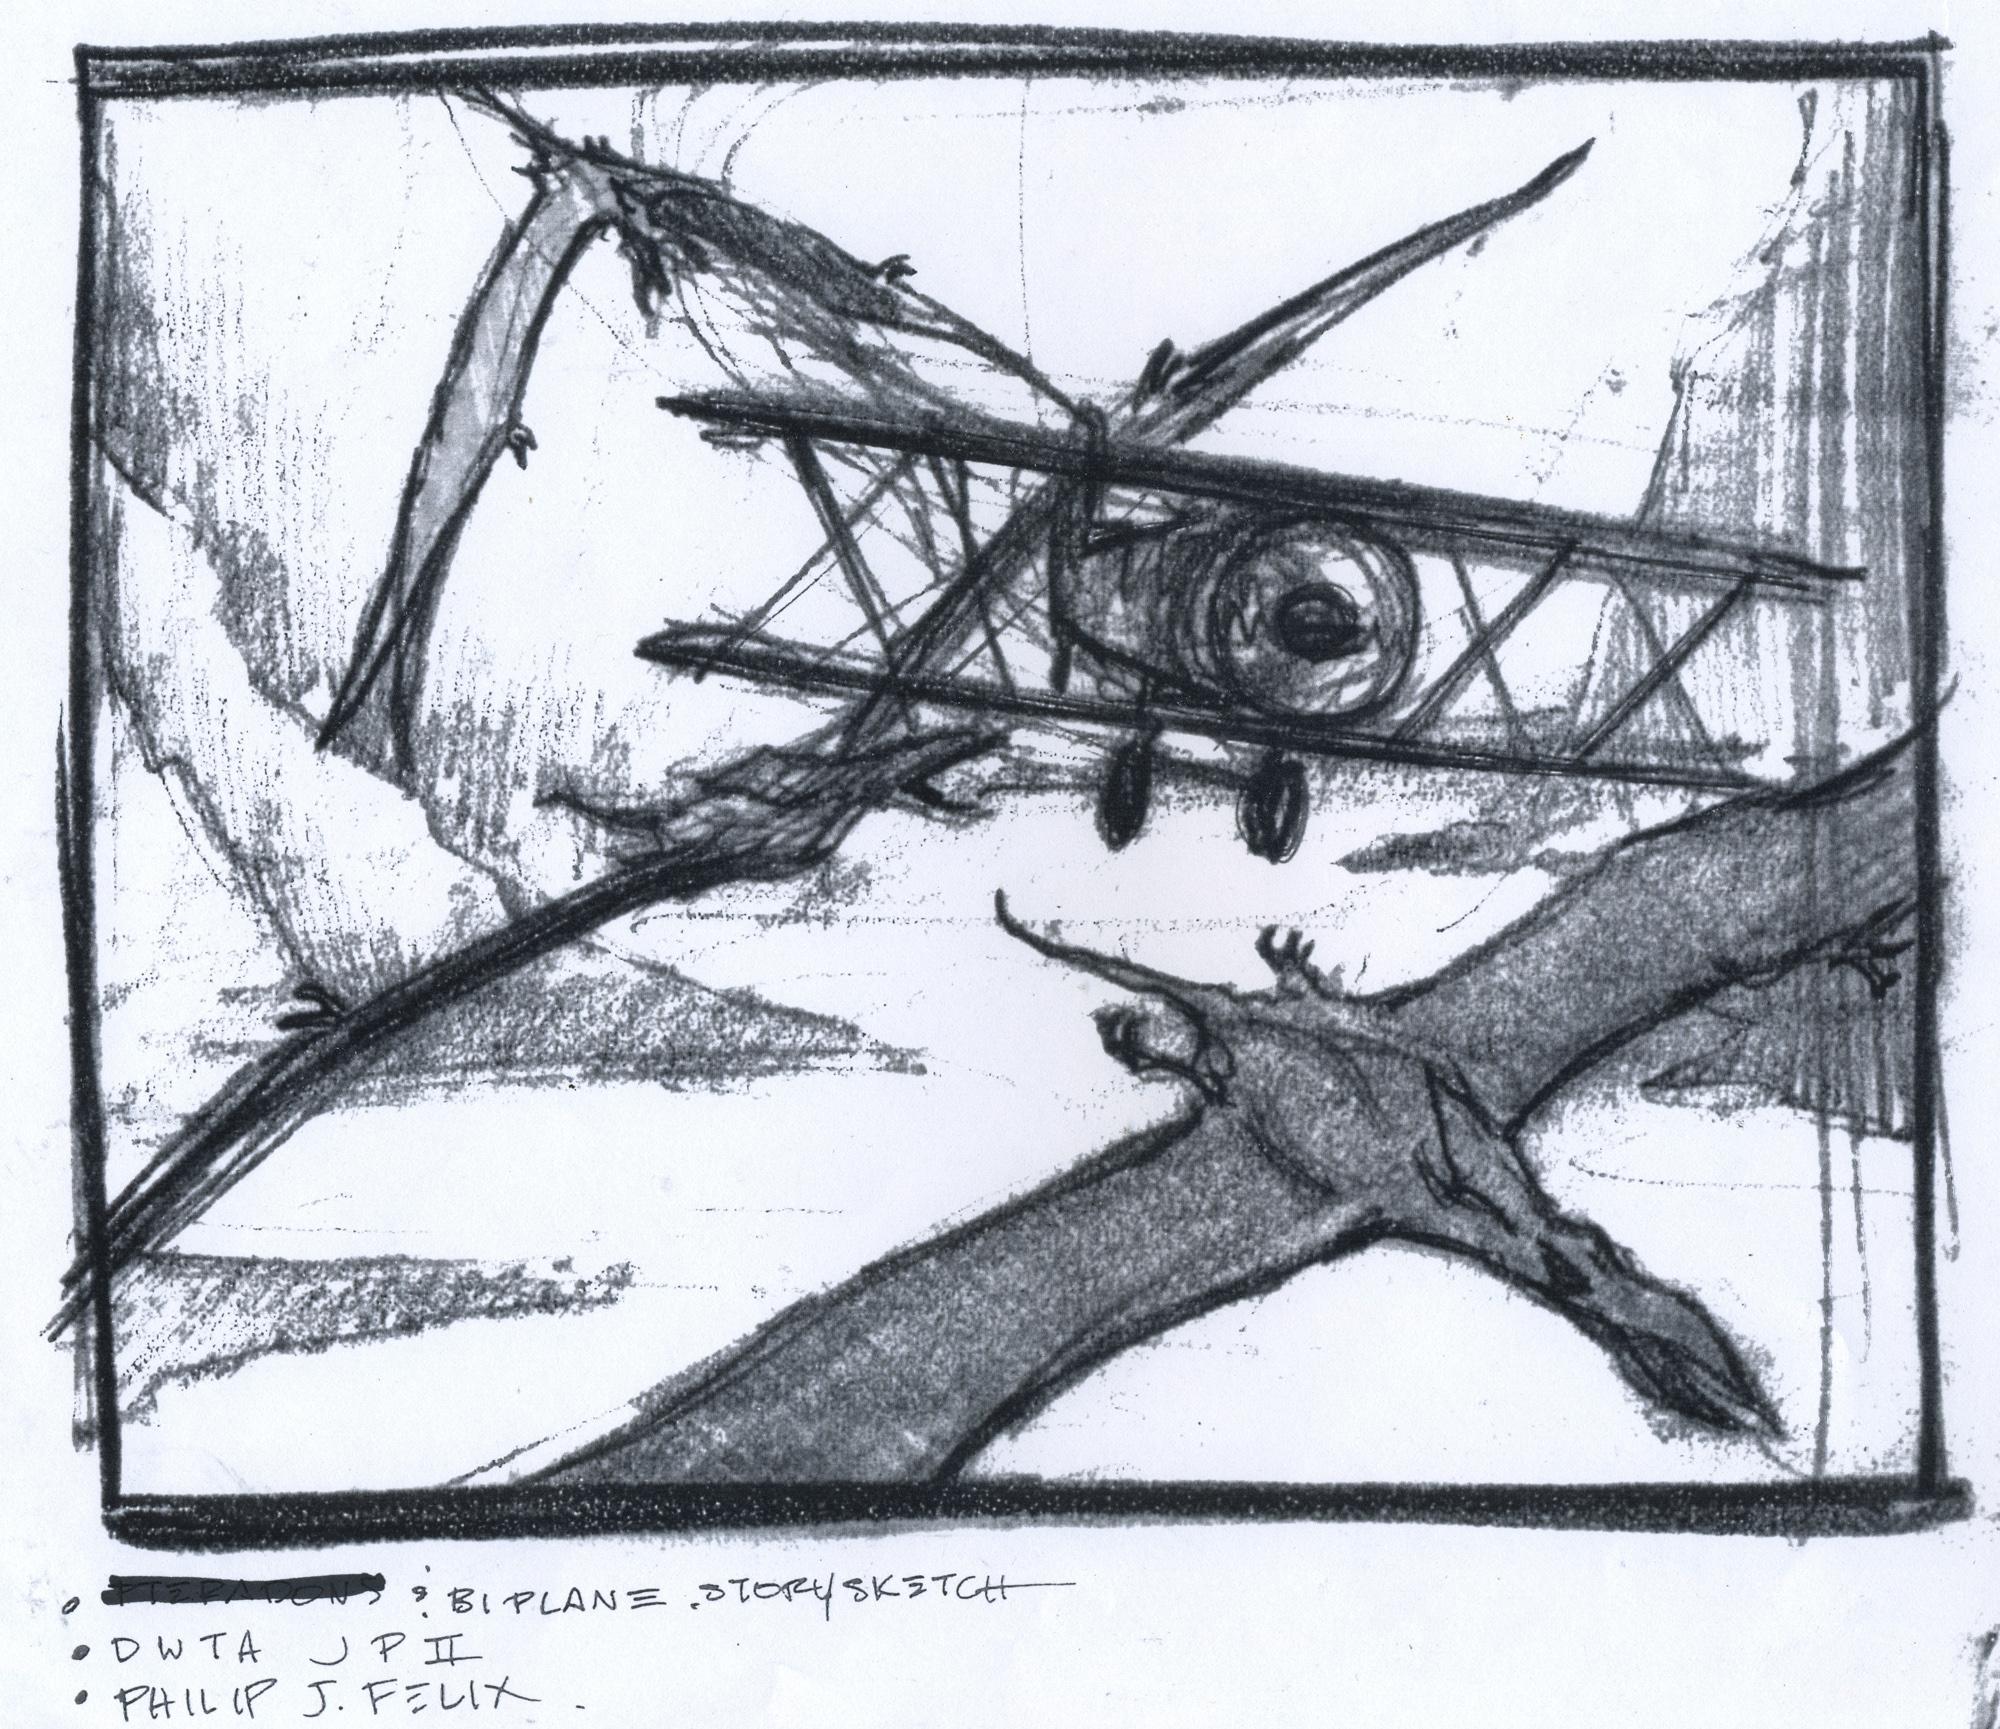 Jurassic Park sketch.